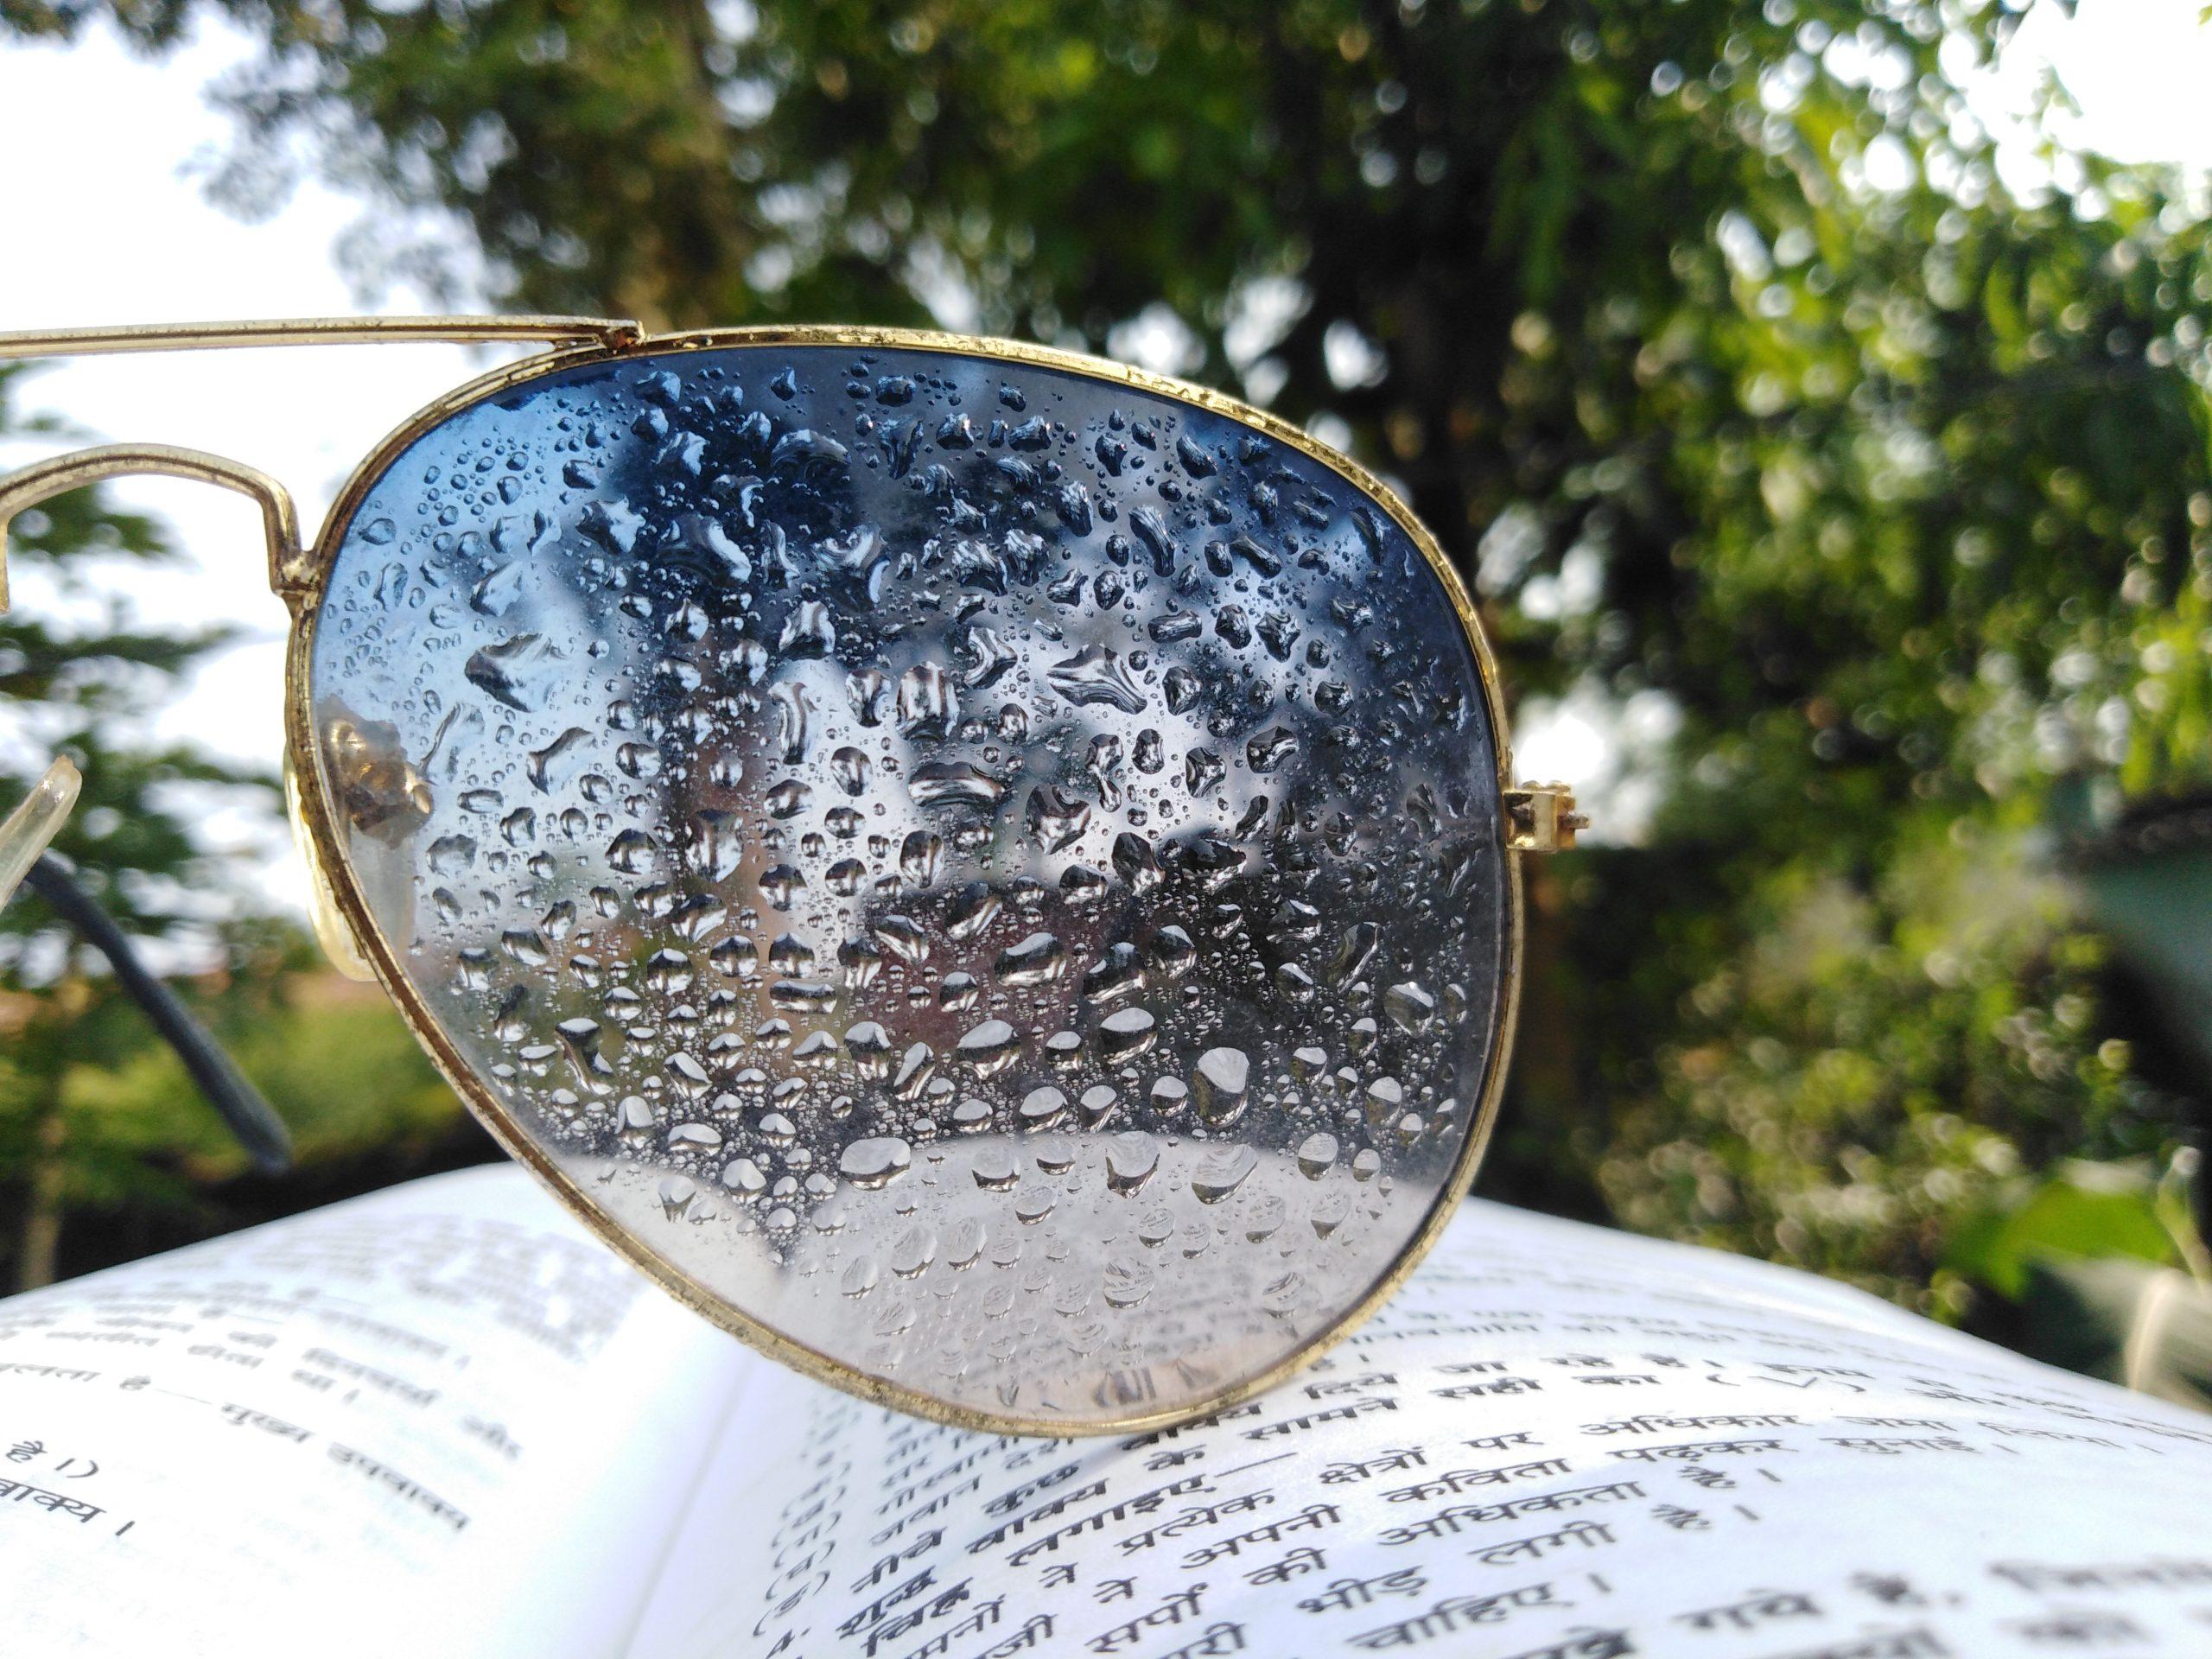 water drop on sunglasses